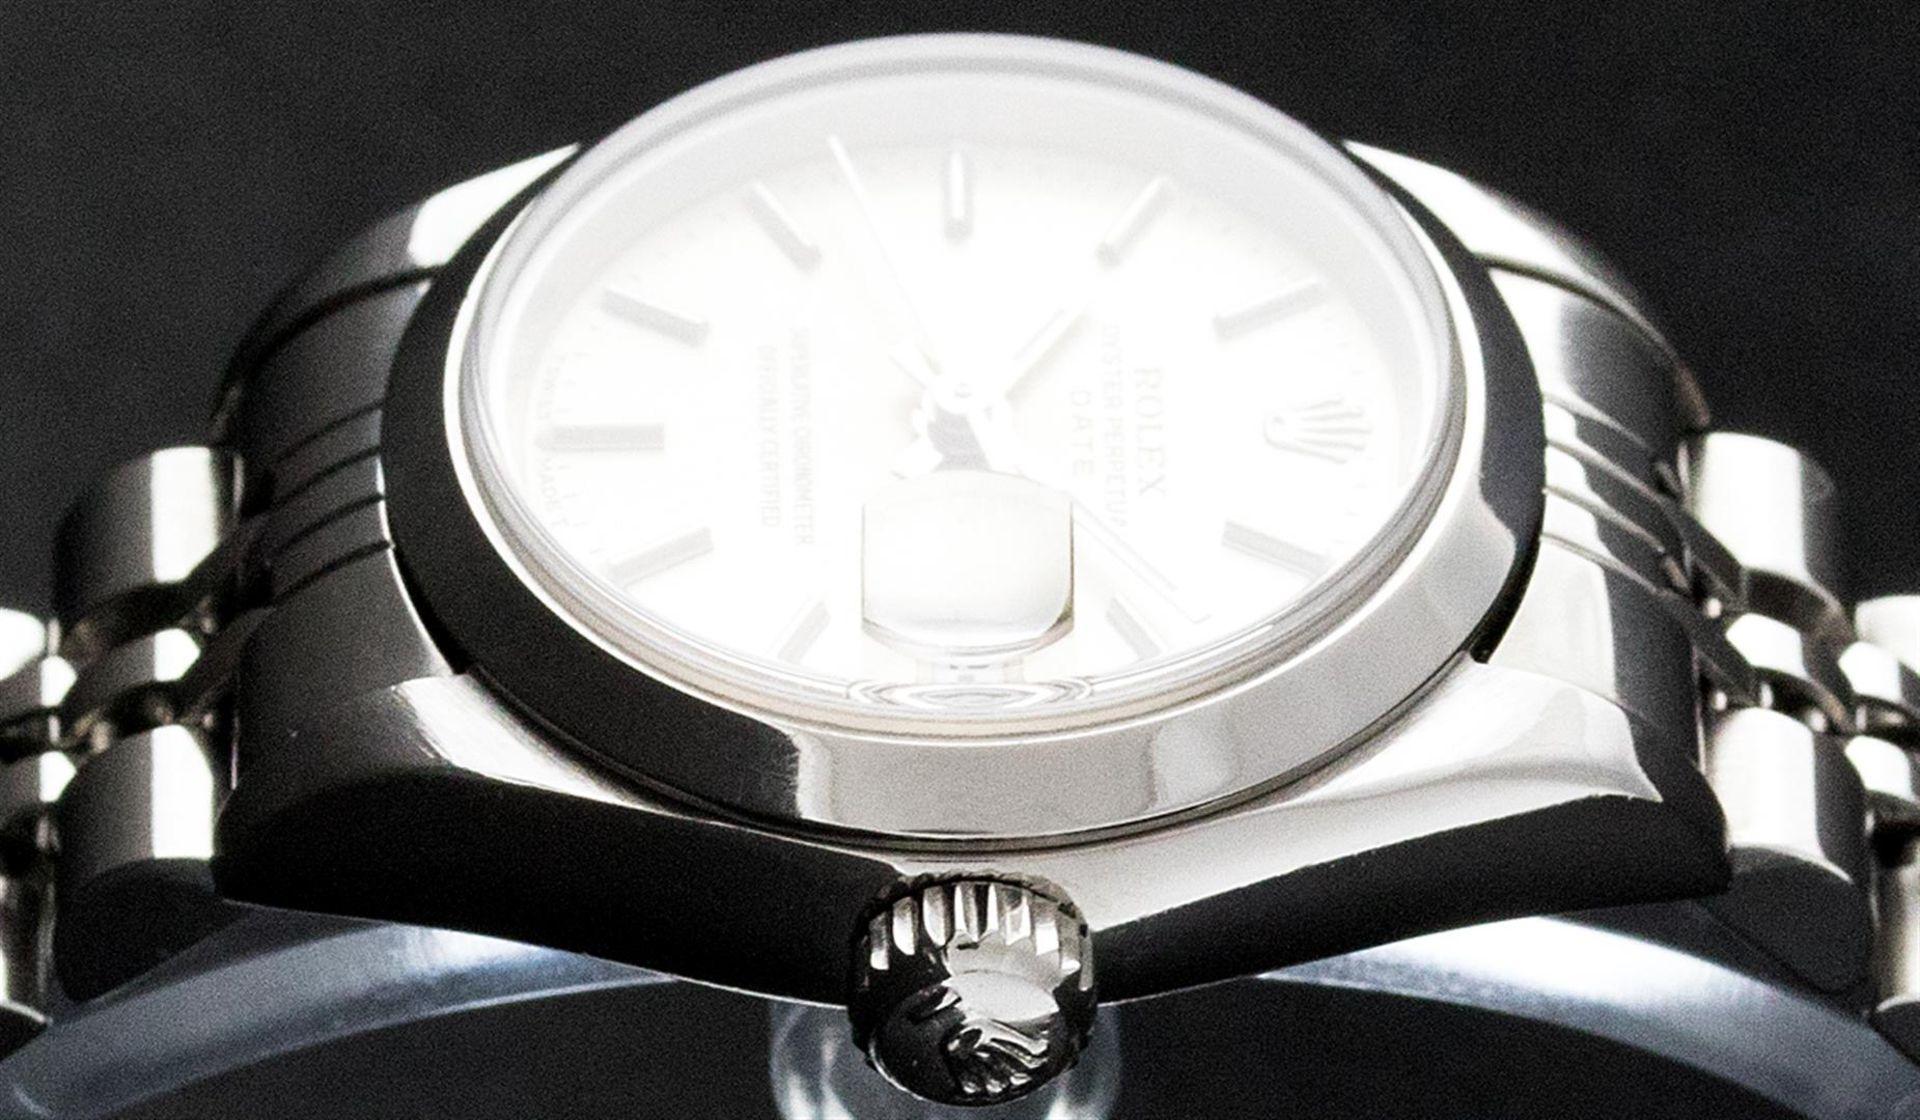 Rolex Ladies Stainless Steel Silver Index 26MM Quickset Datejust Wristwatch - Image 4 of 9